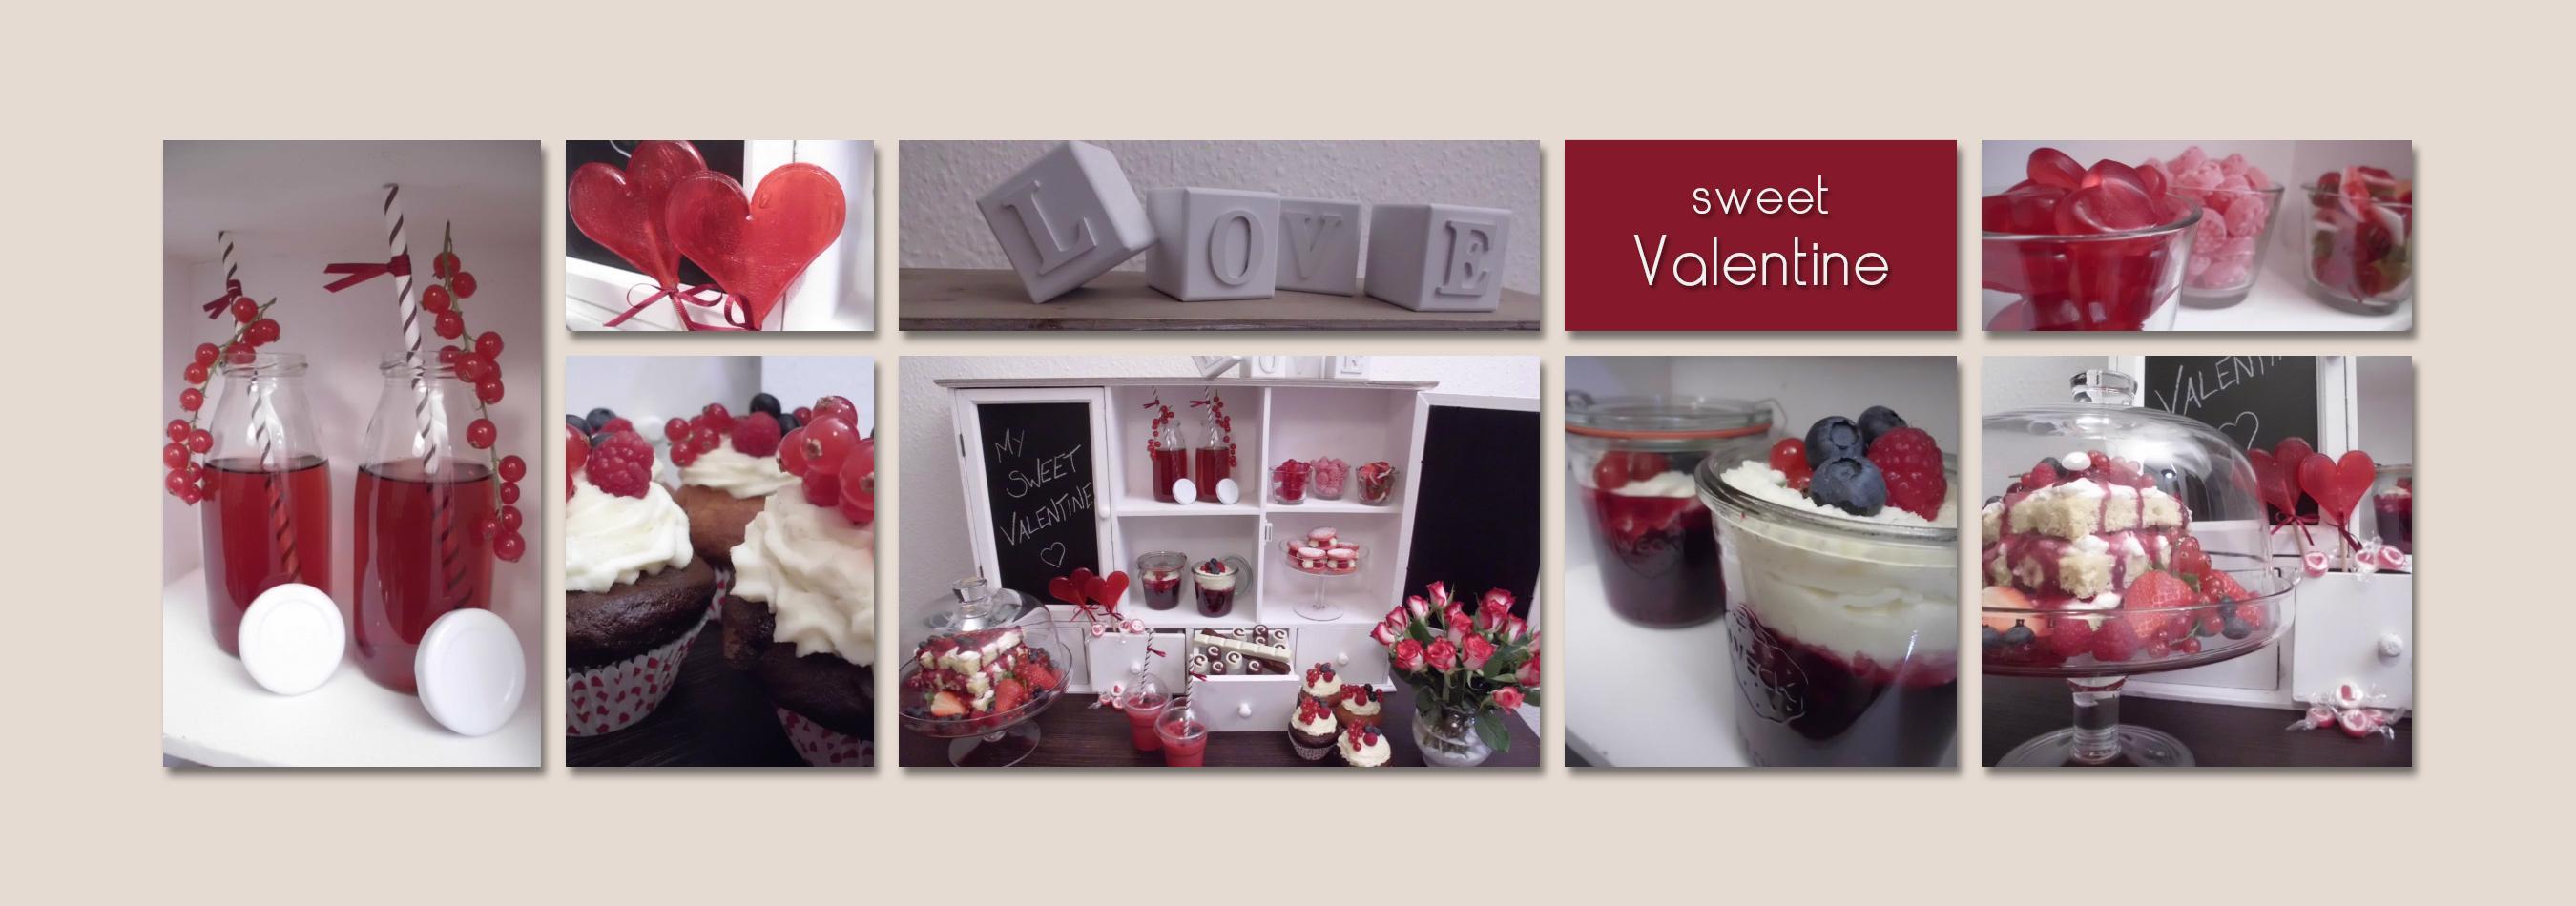 08_sweet-valentine.jpg